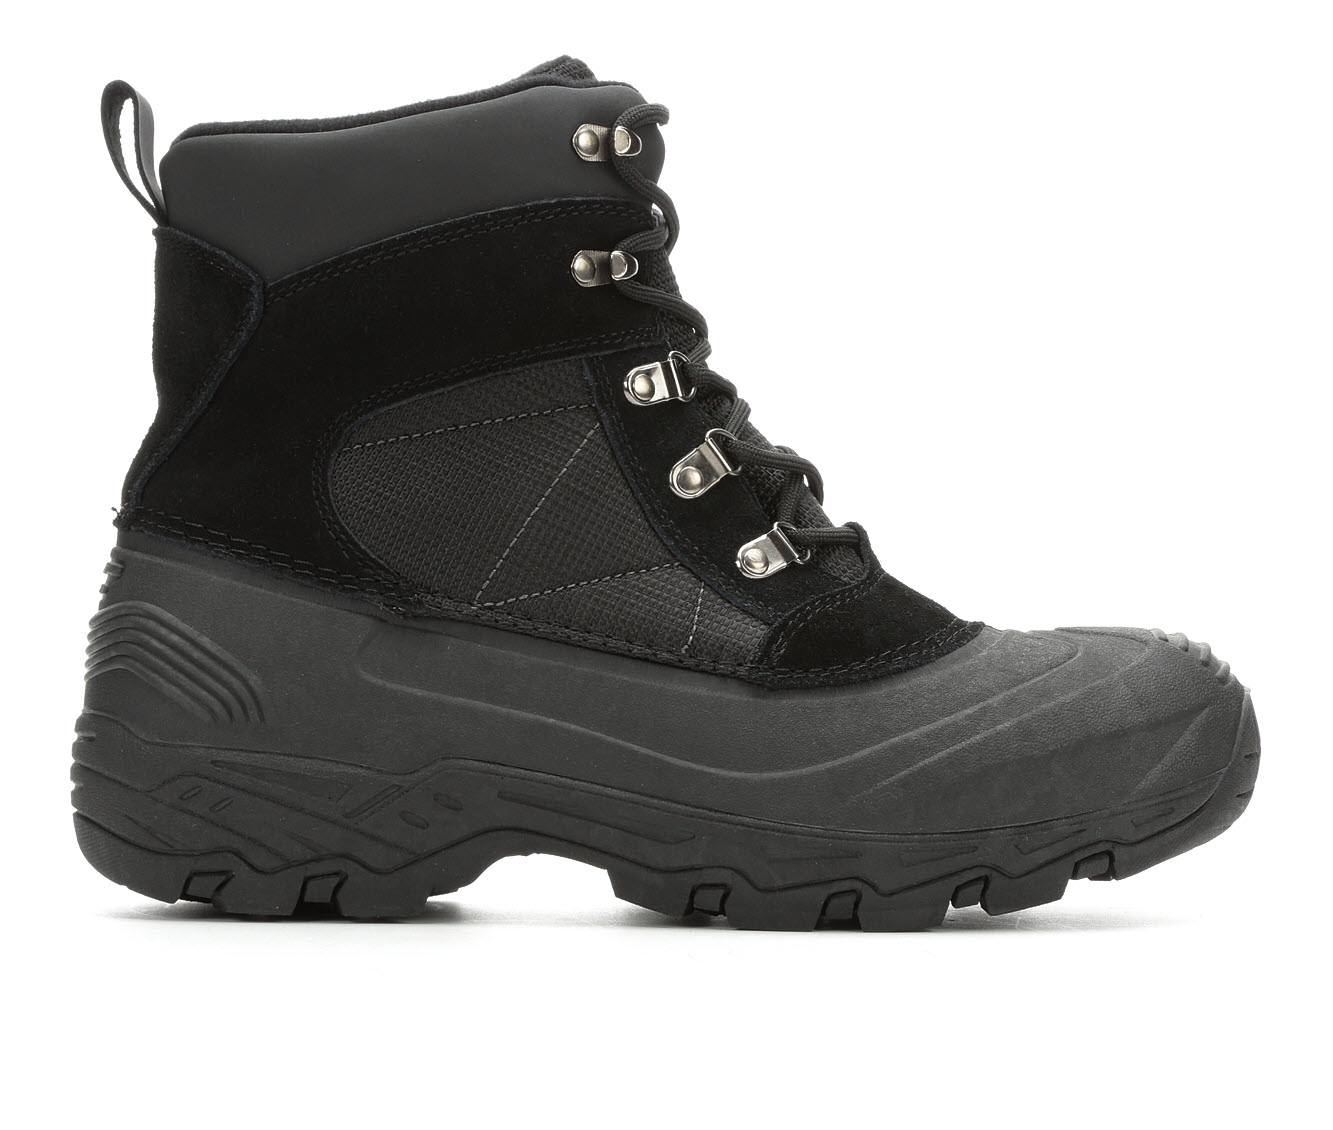 London Fog Woodside Men's Boots (Black Faux Leather)